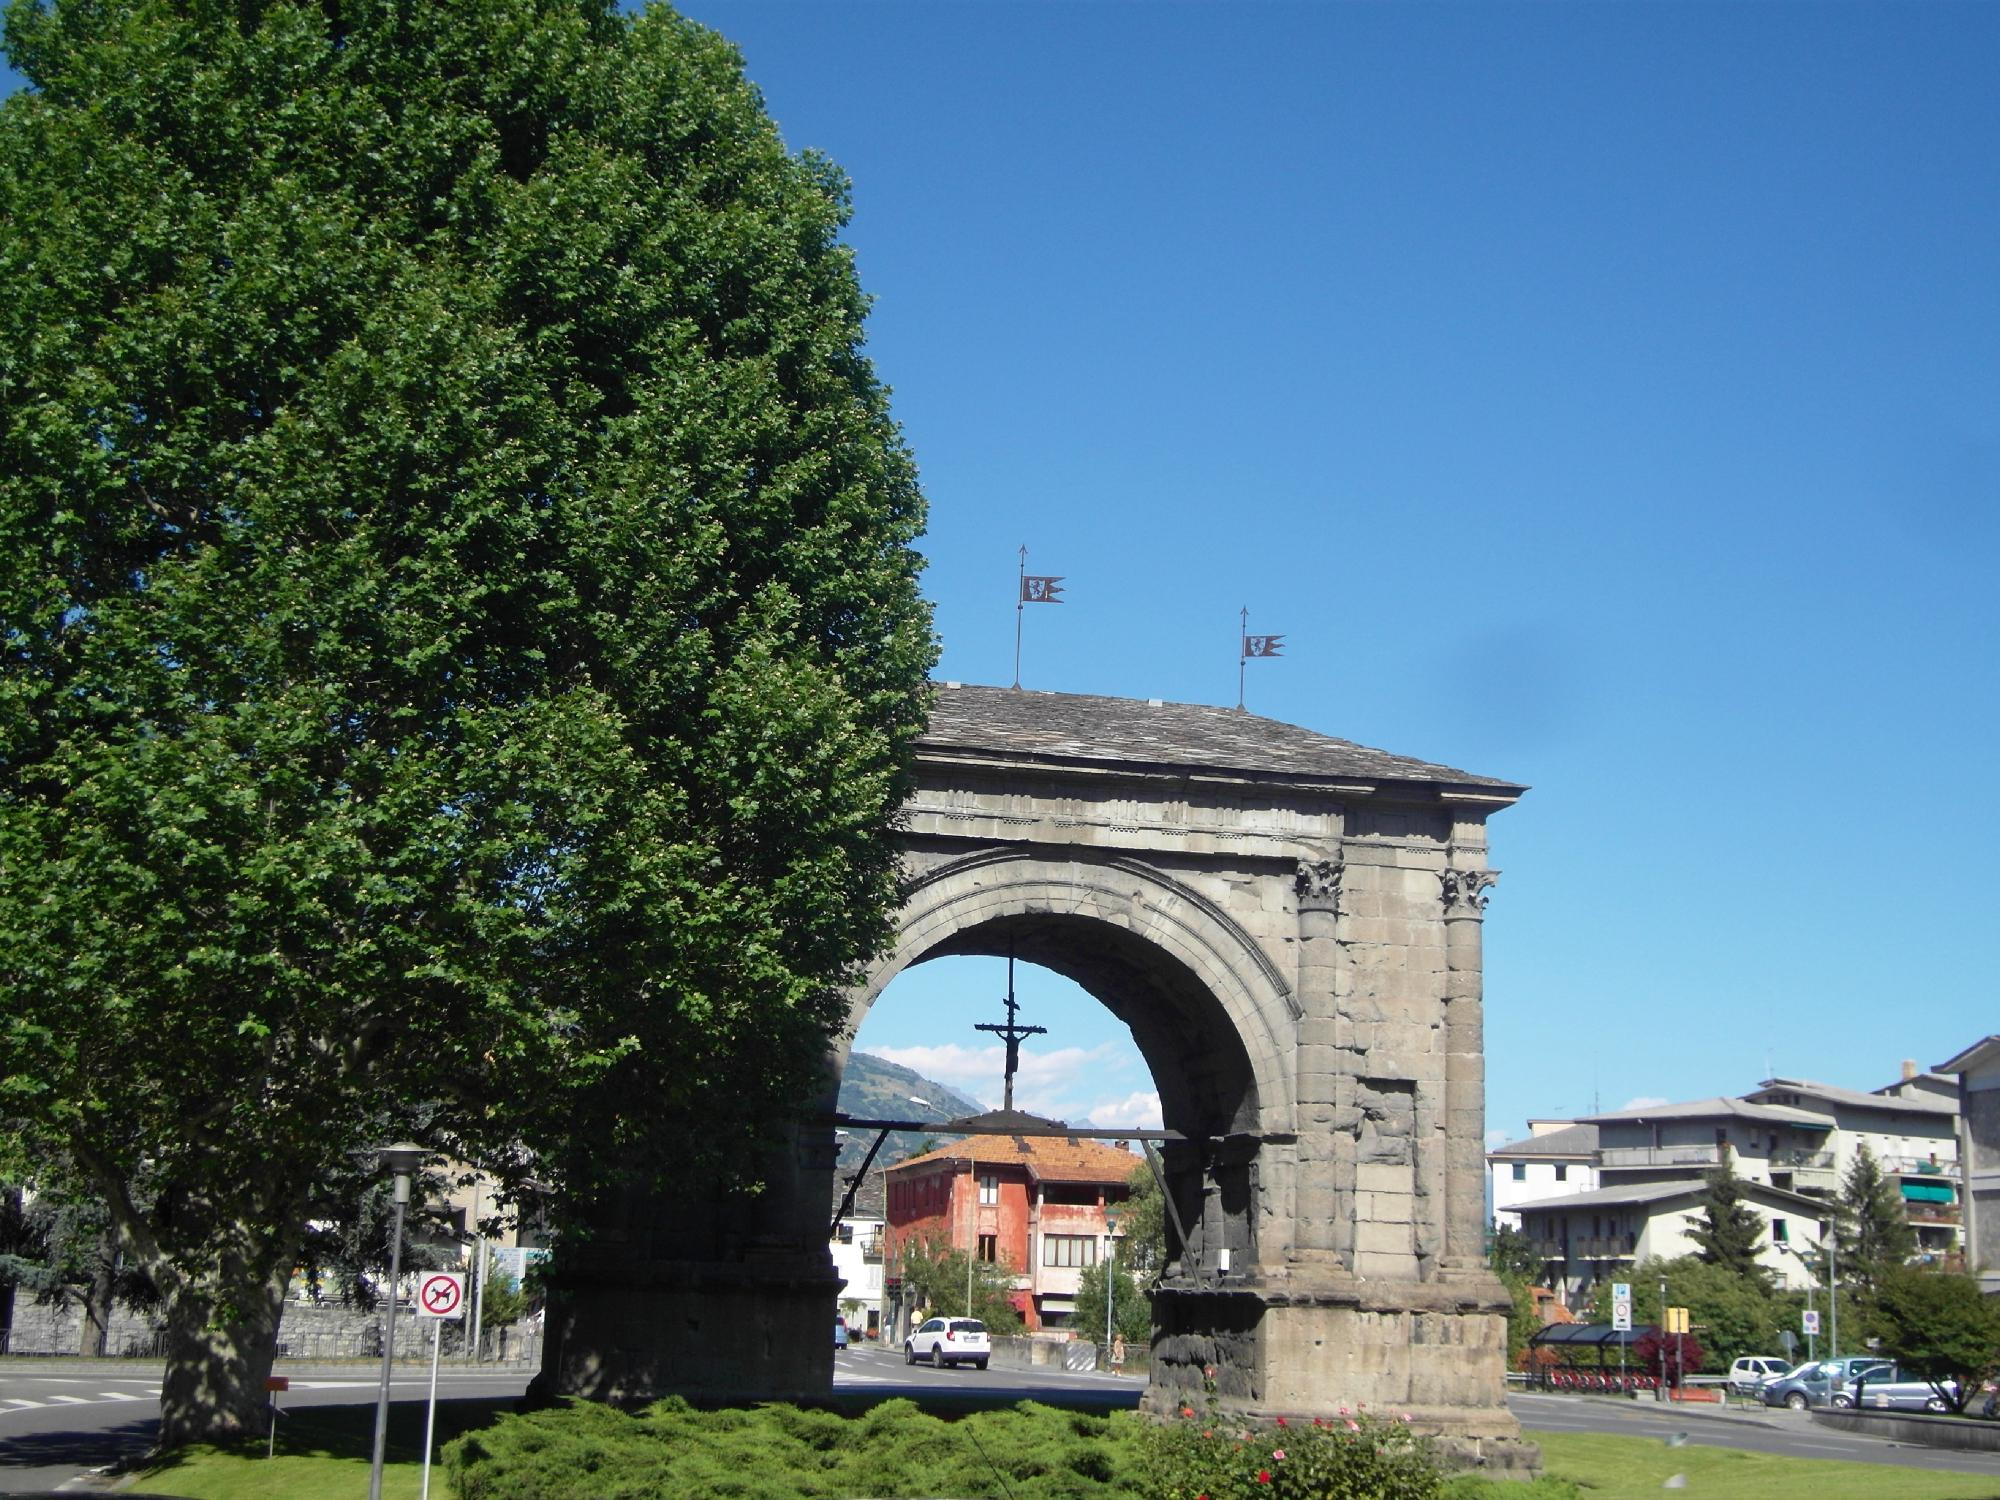 Arco Onorario d'Augusto